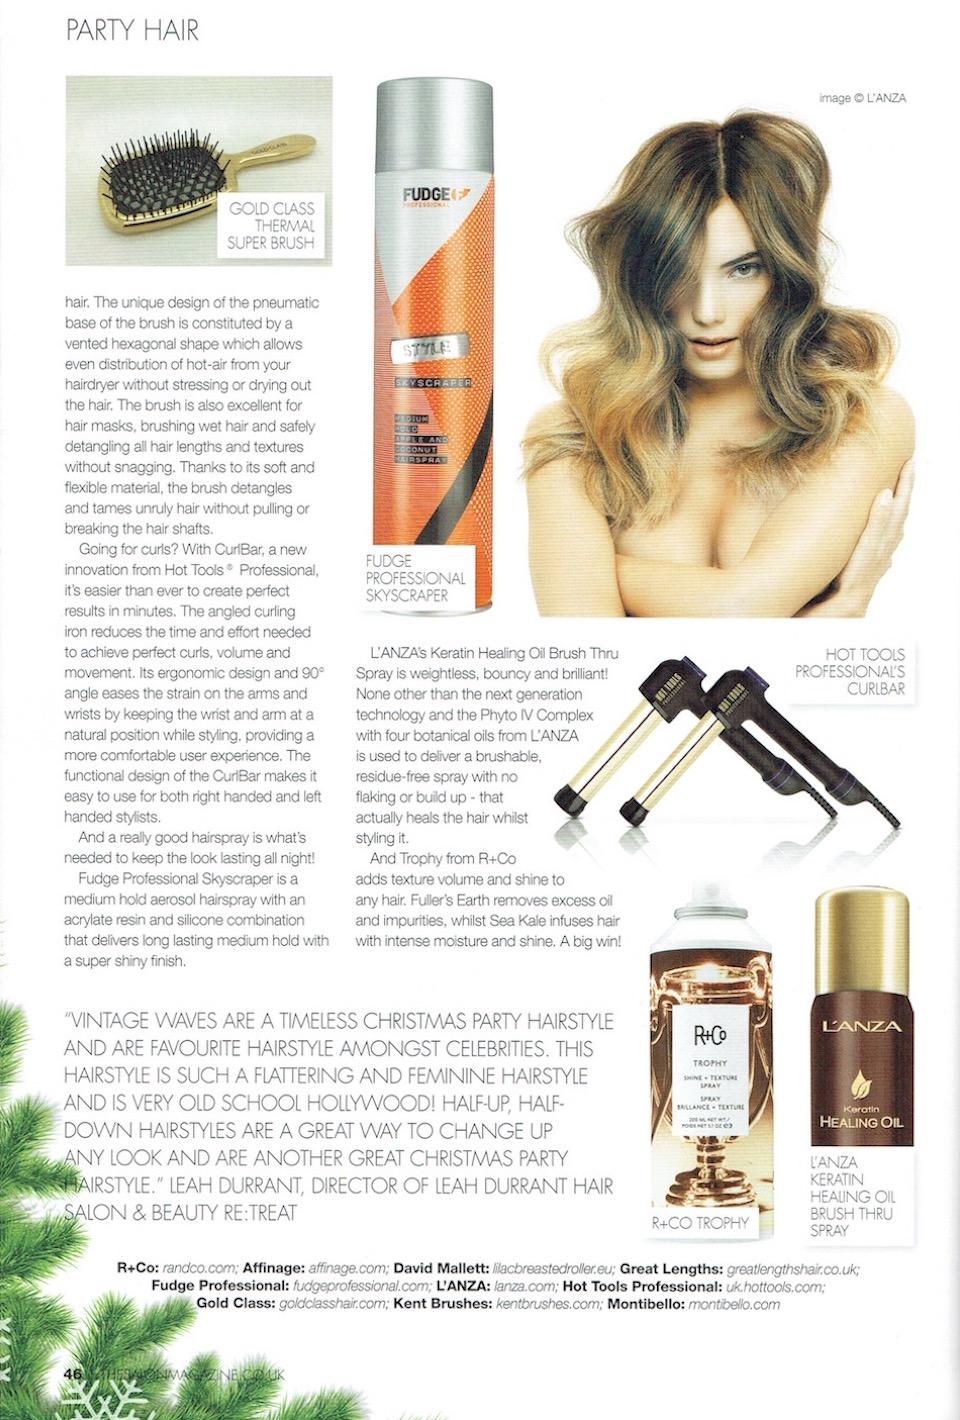 The Salon Magazine, Gold Class thermal super brush